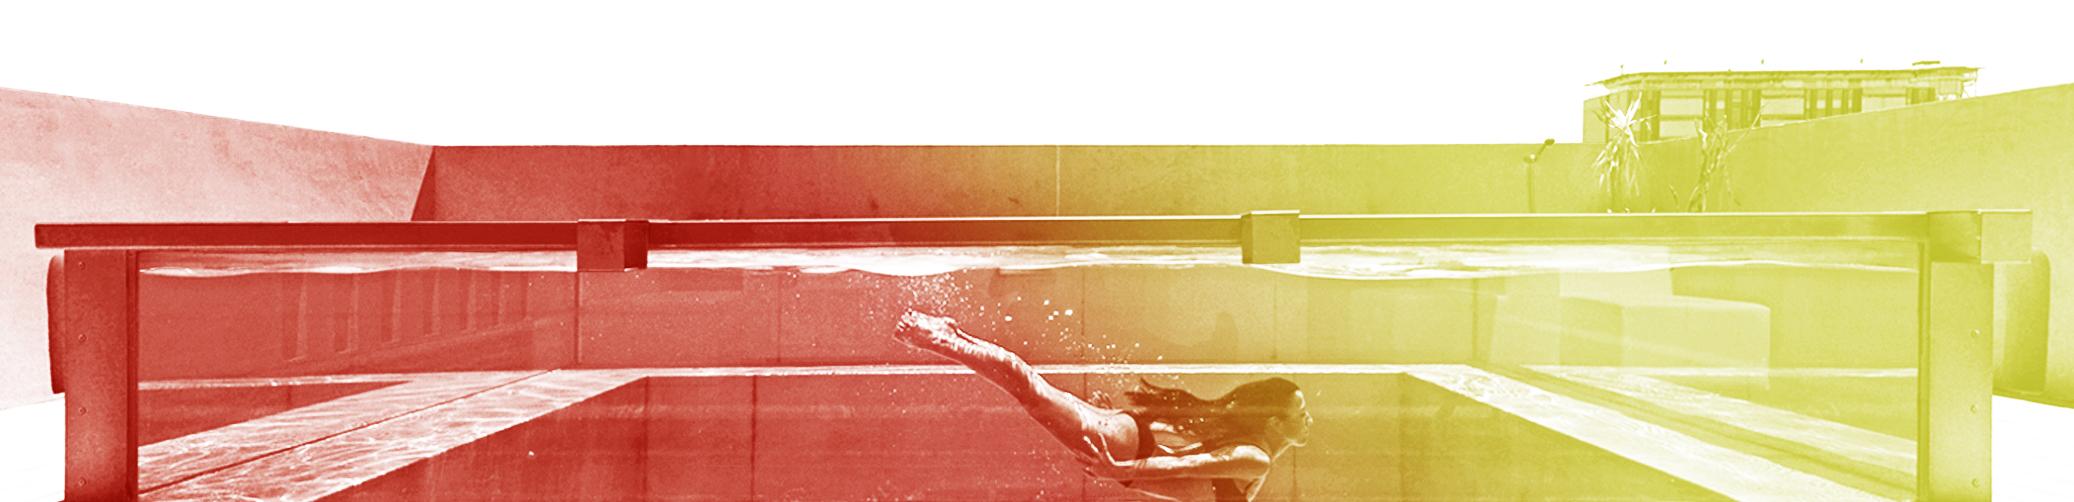 Playamedia Pool